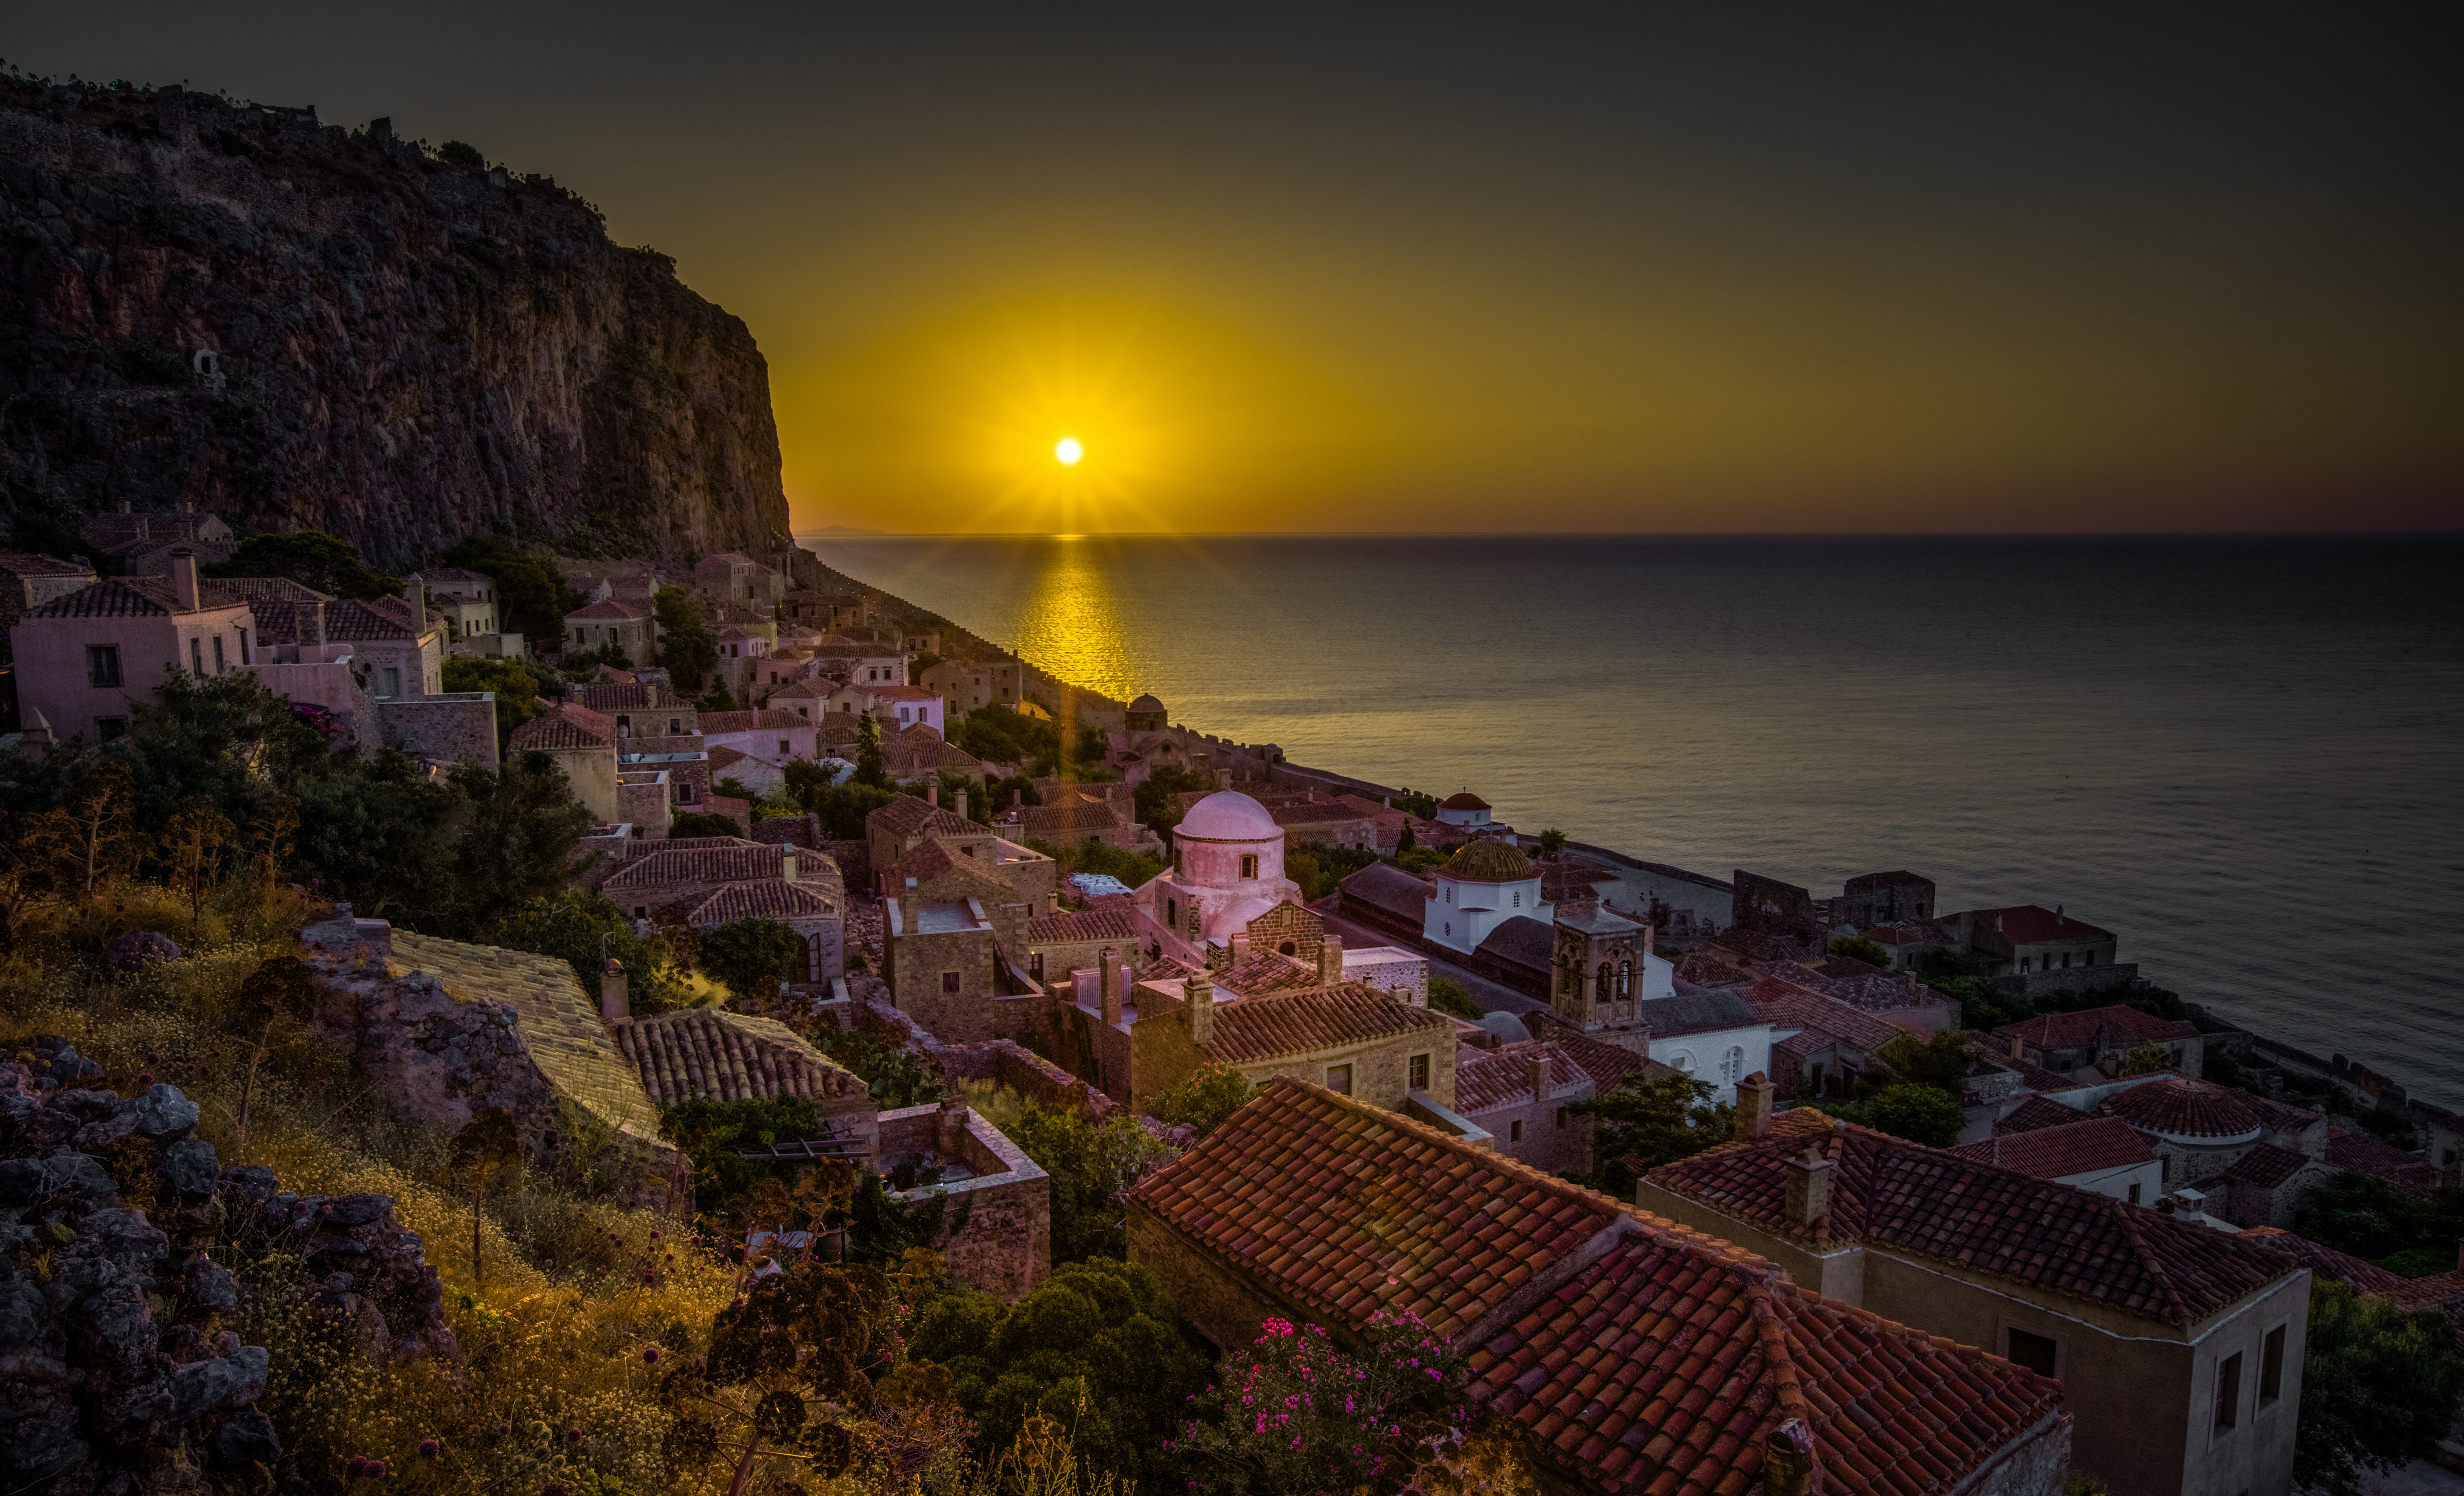 Photos Greece Monemvasia Sun Sea Roof Rock Sunrises and 4940x3000 4940x3000